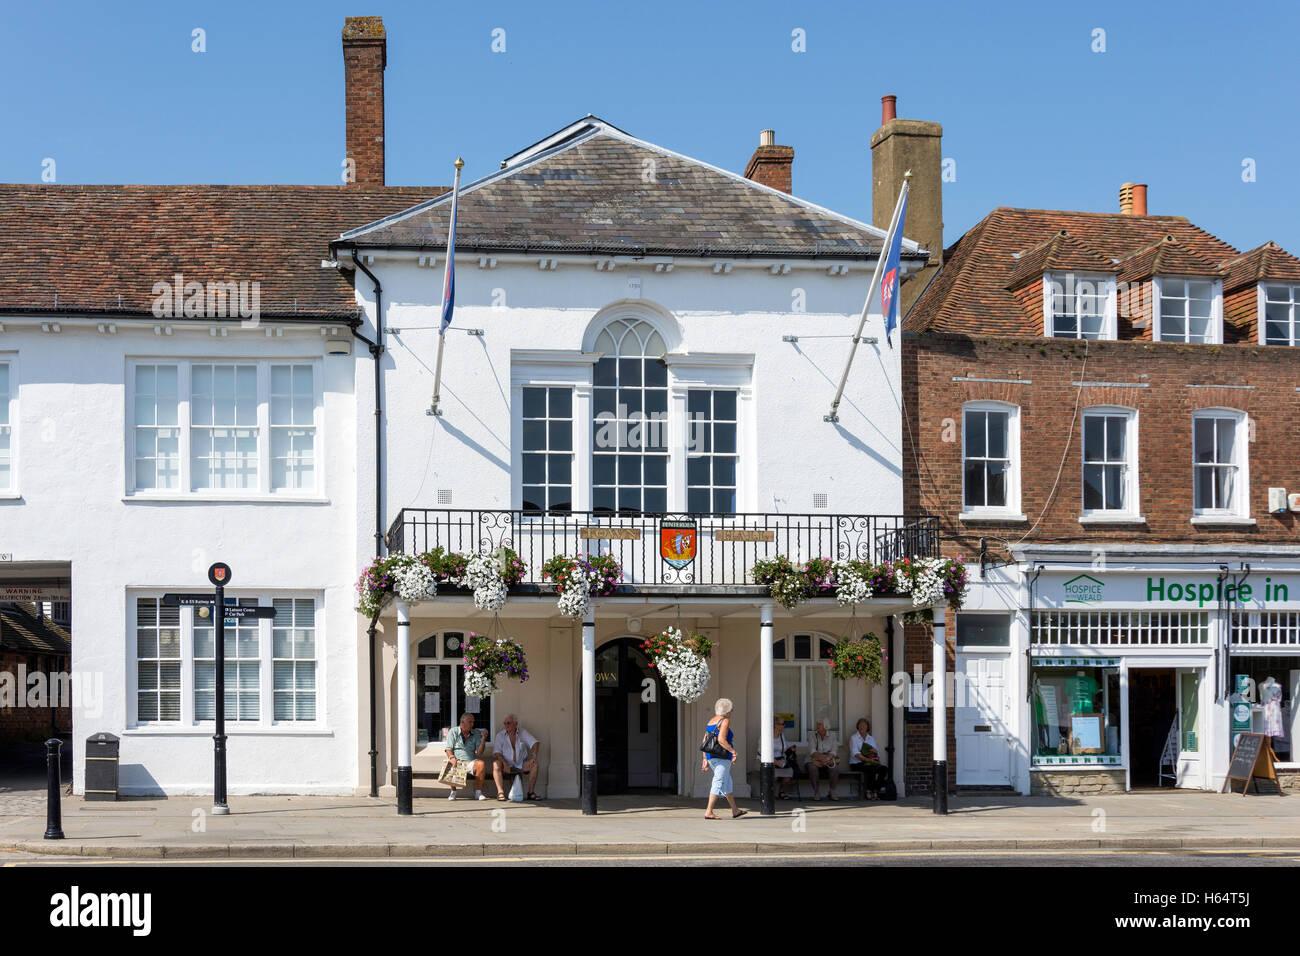 Tenterden Town Hall, High Street, Tenterden, Kent, England, United Kingdom - Stock Image